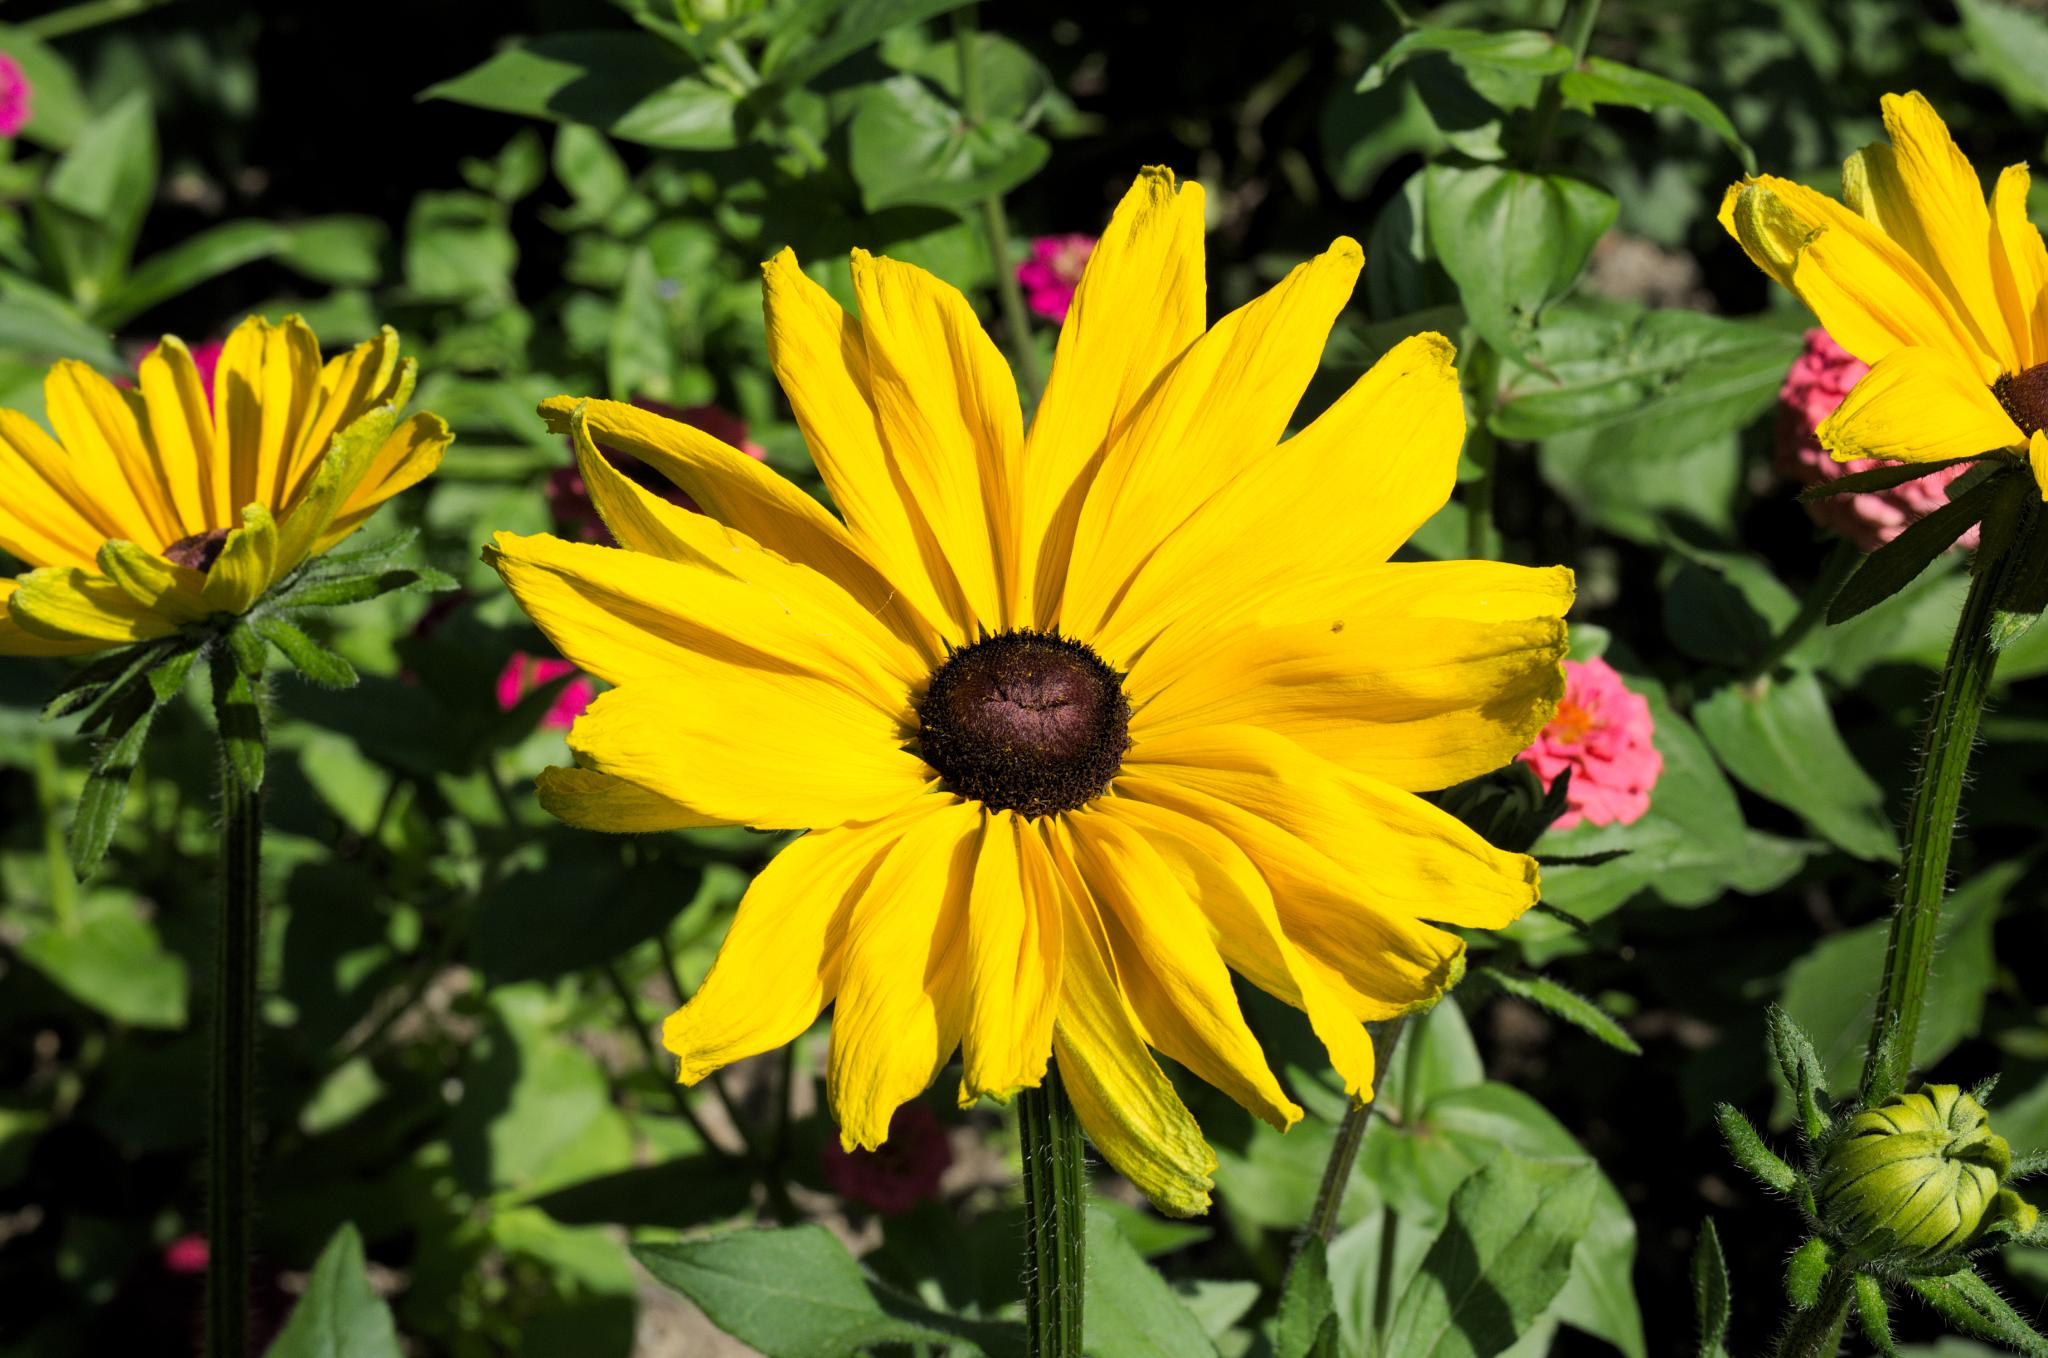 Sunny flower by Anatoliy Ashmyanskiy